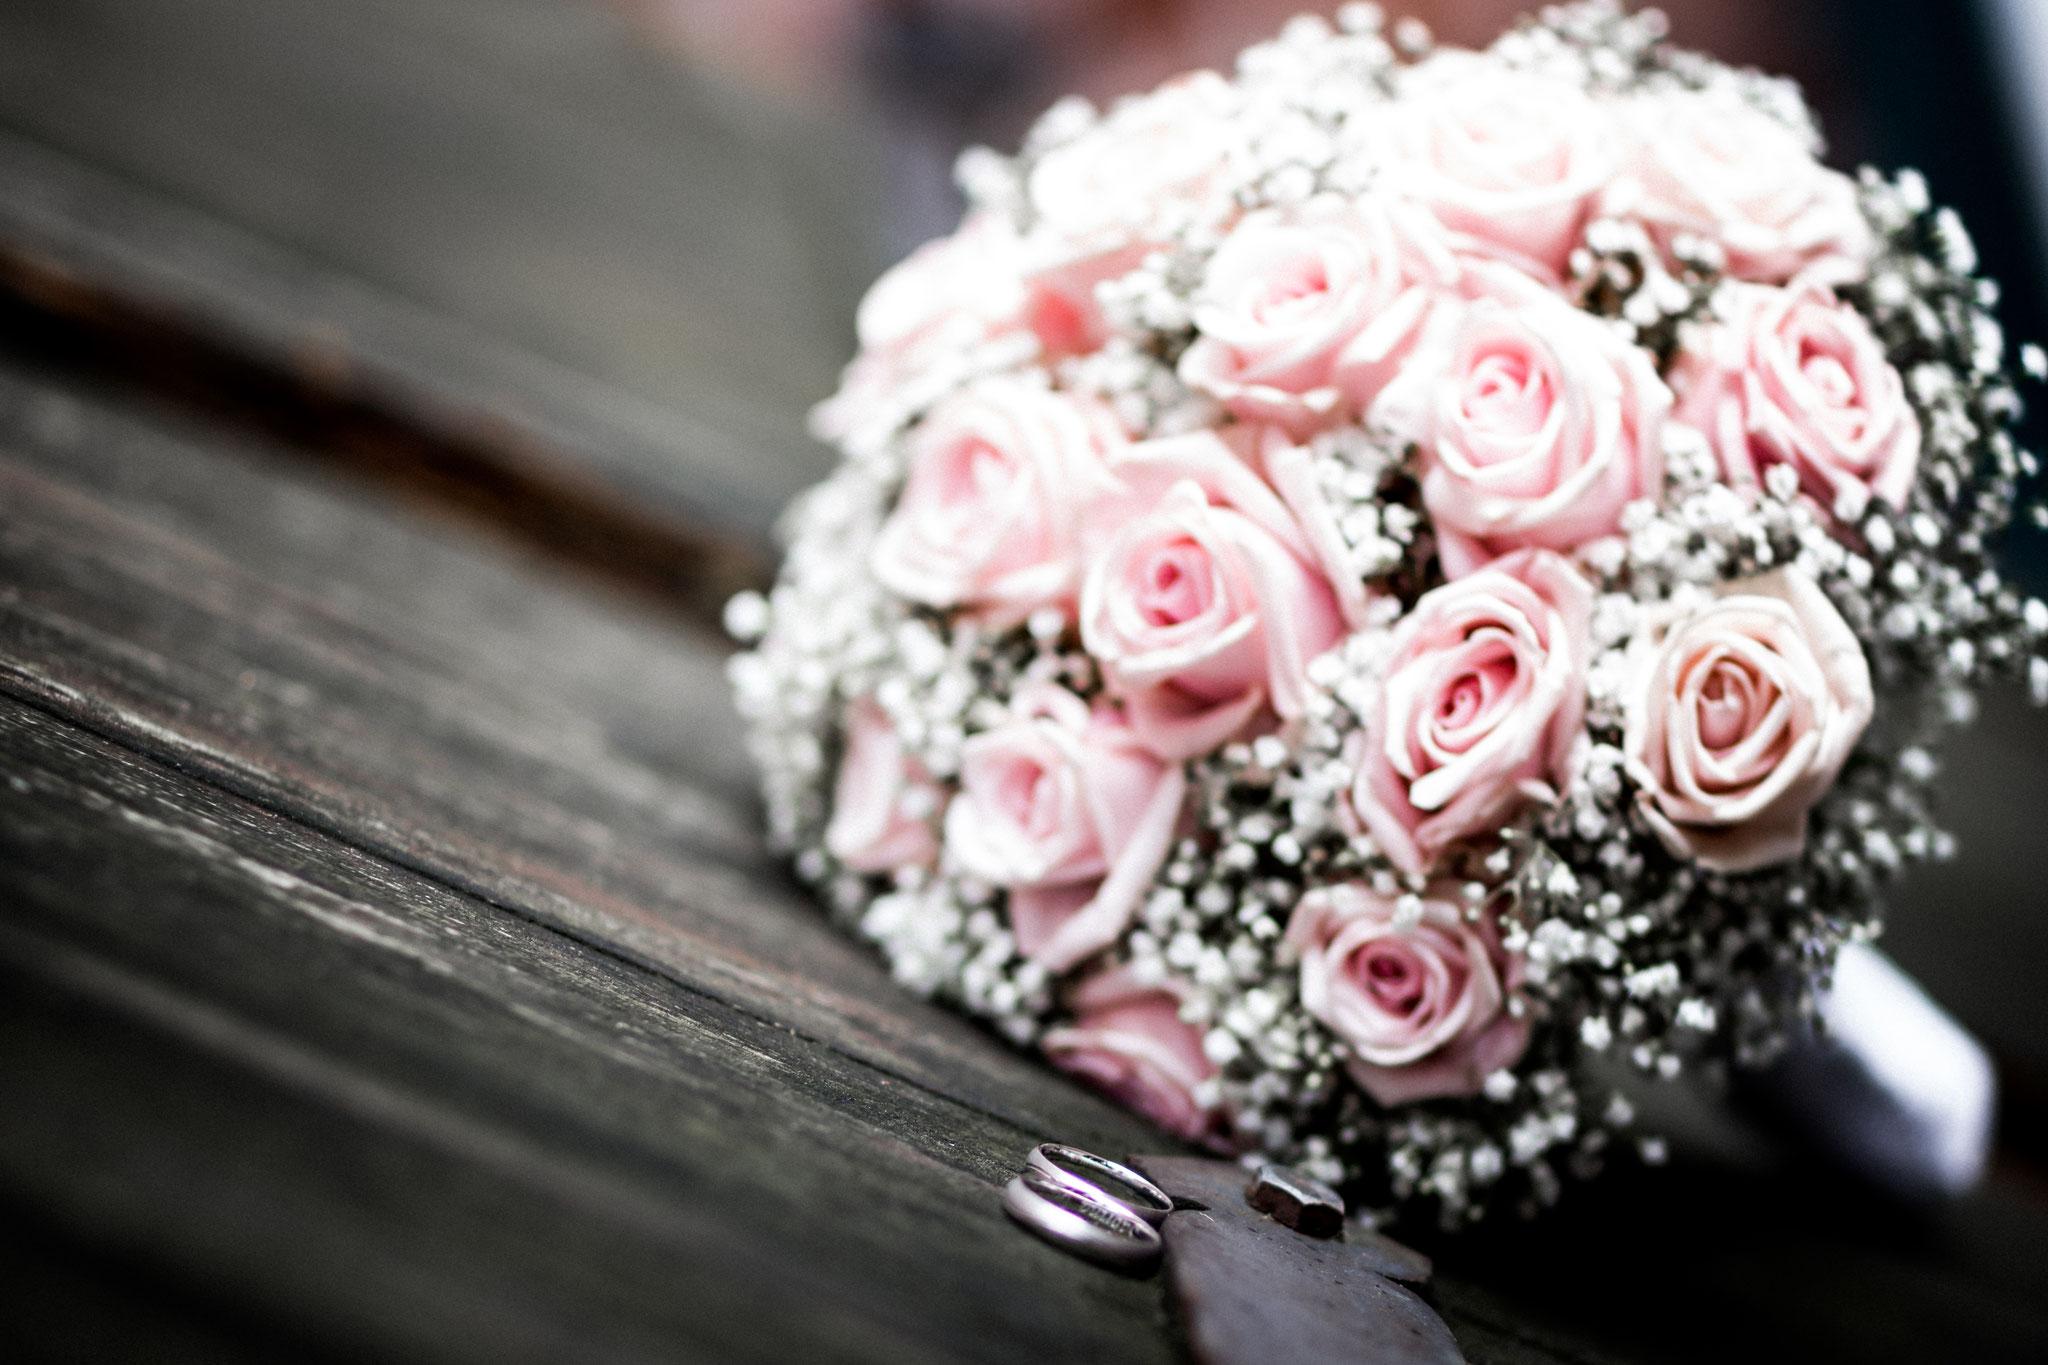 Eheringe & Brautstrauß